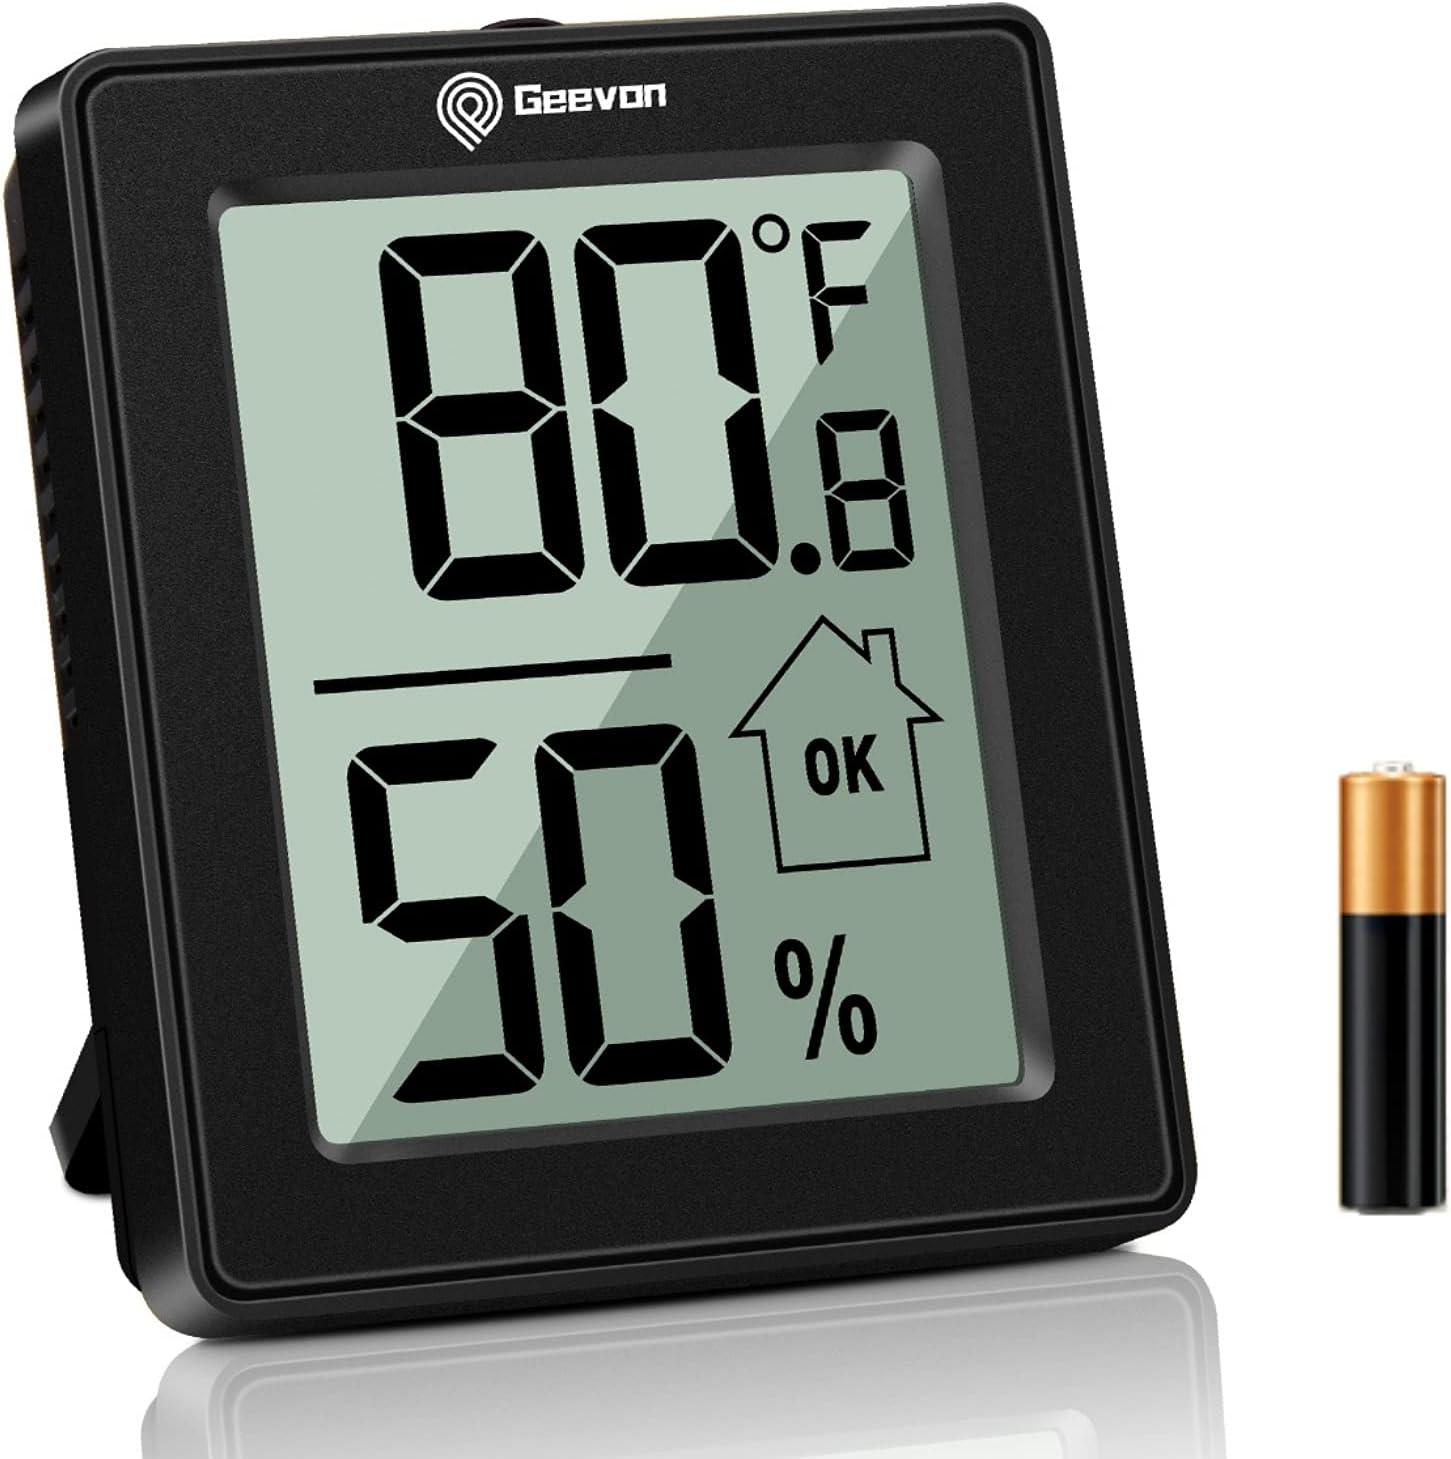 Indoor Room Hygrometer Thermometer LCD Digital Temperature Humidity Meter Clock